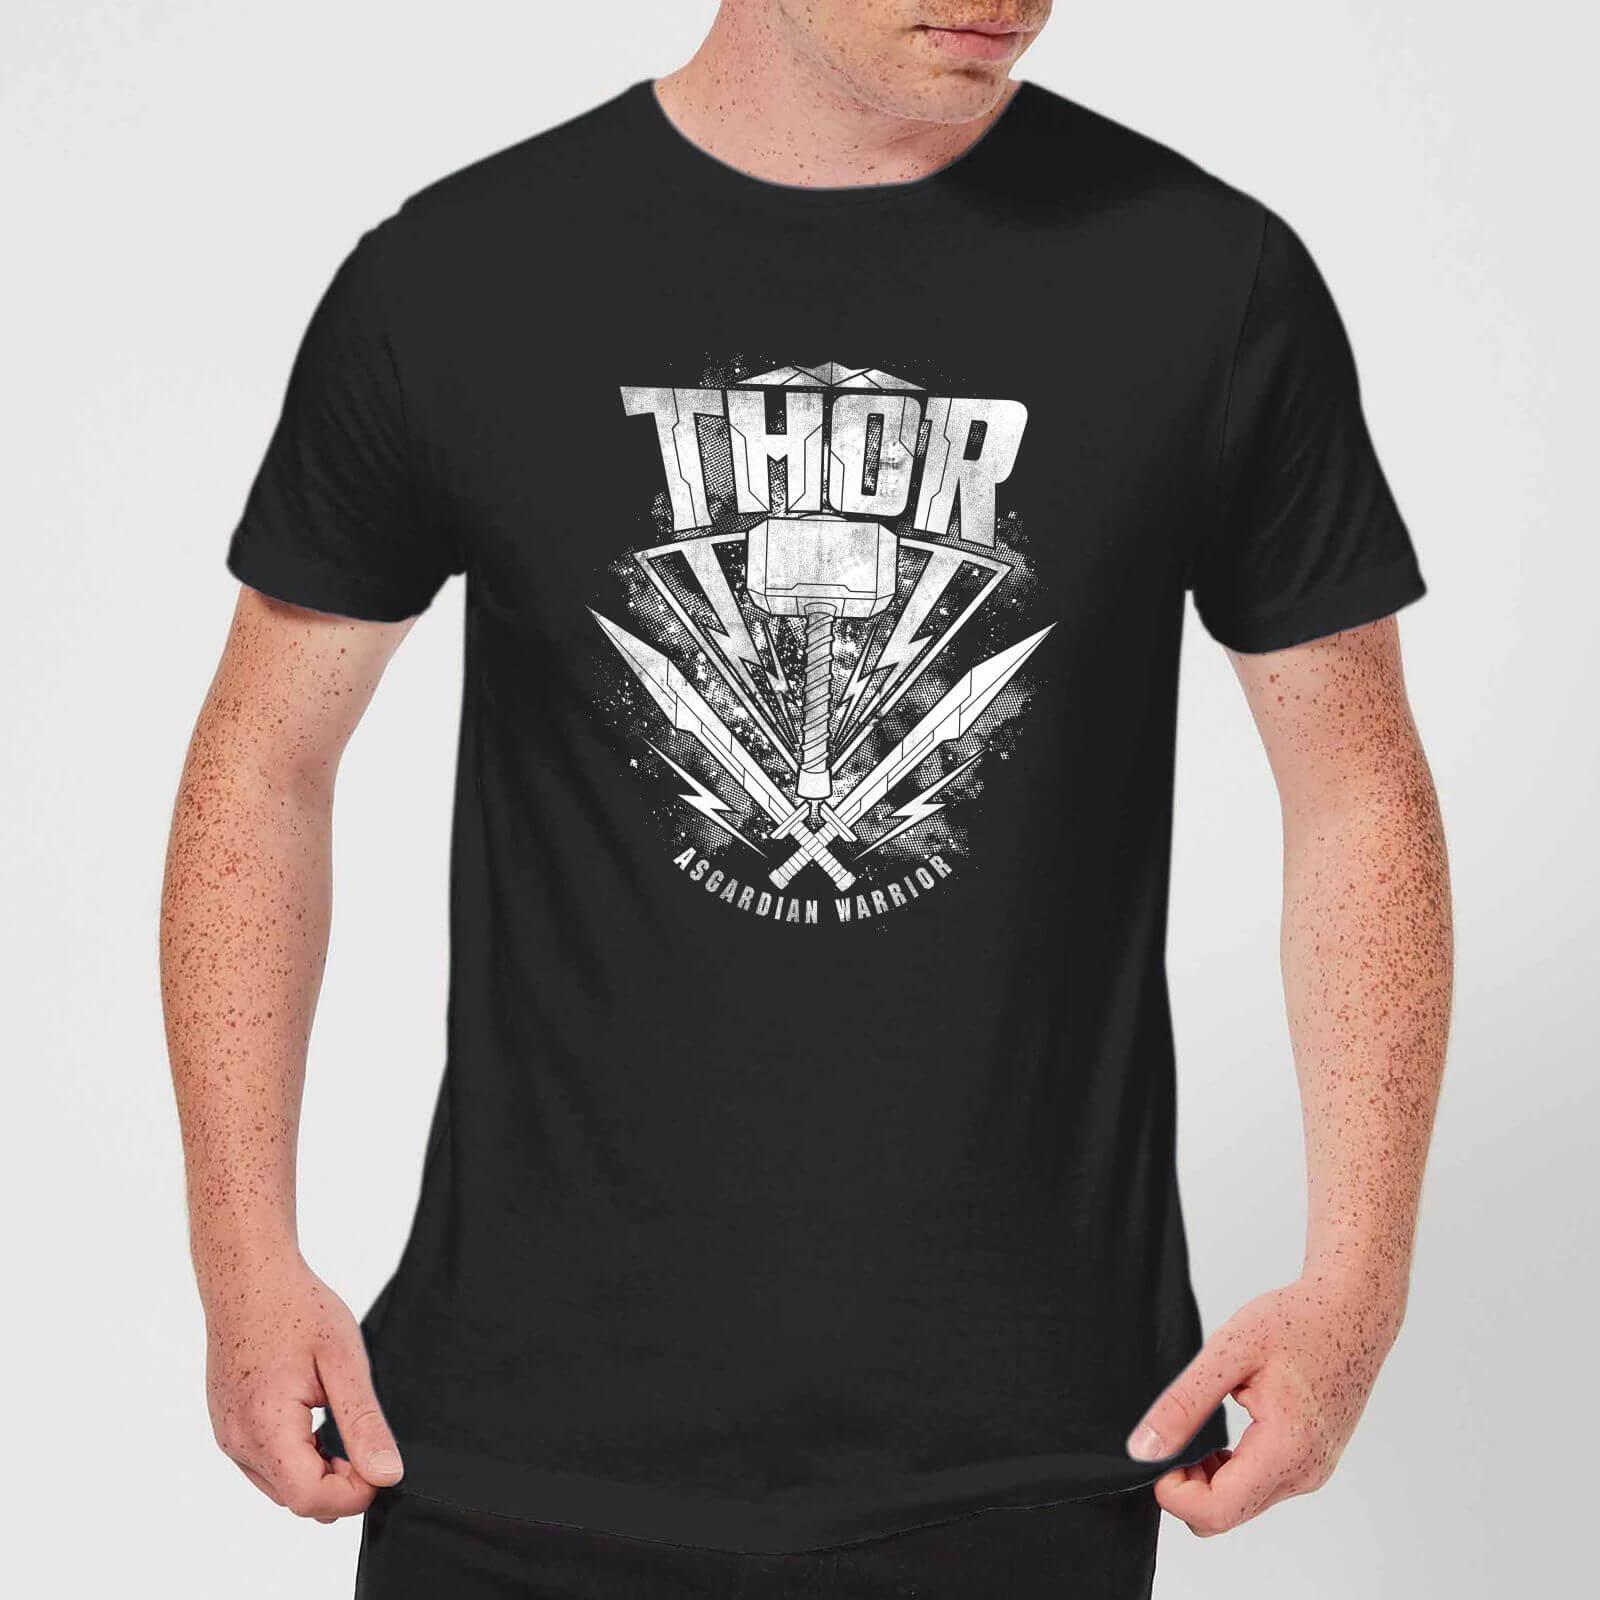 OfferteWeb.click 03-marvel-thor-ragnarok-thor-hammer-logo-men-s-t-shirt-black